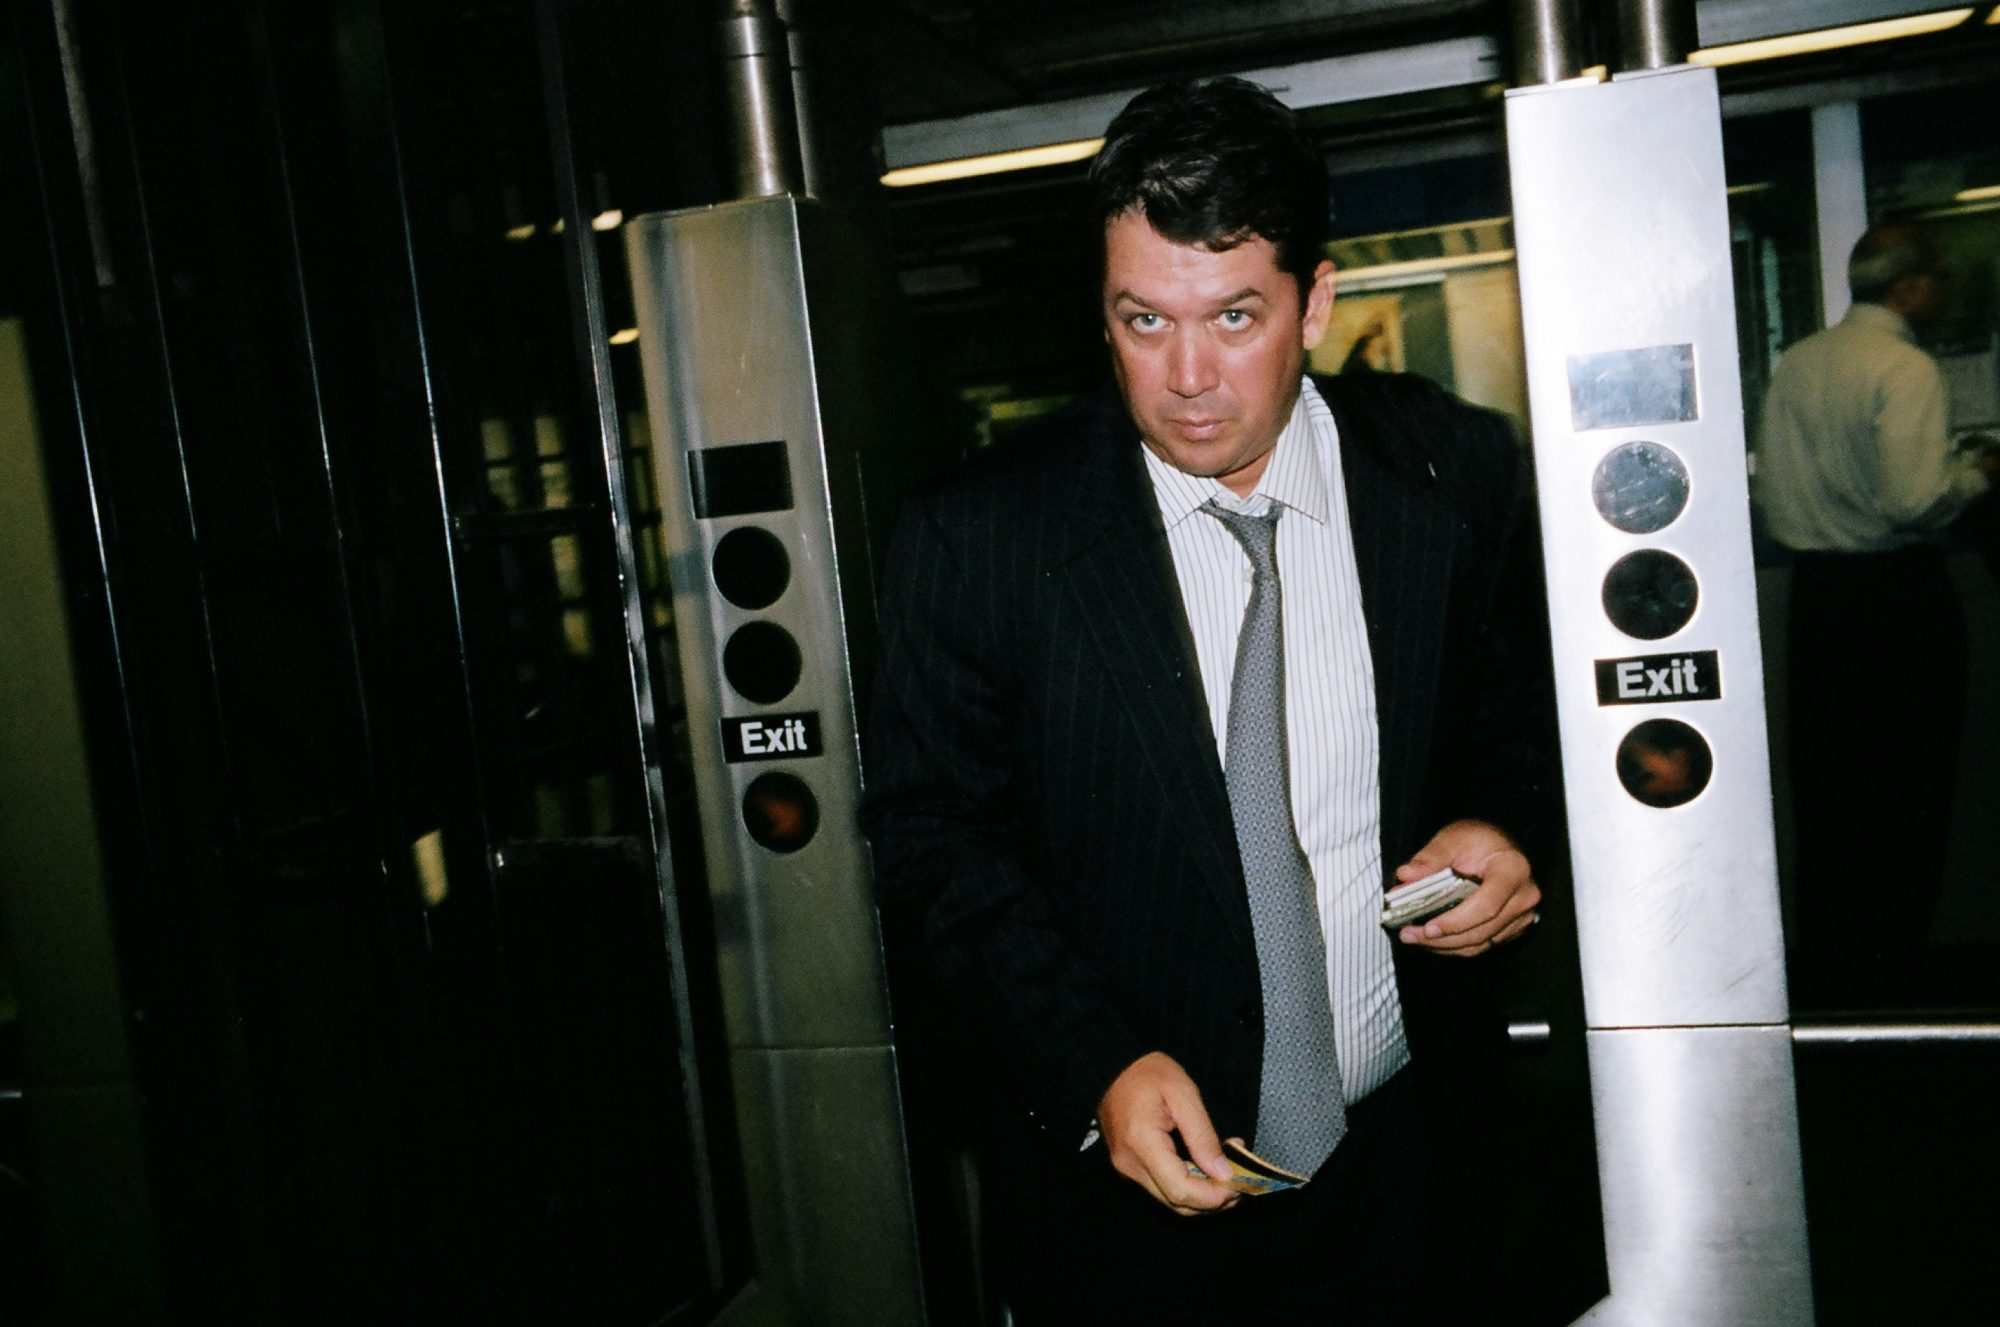 man subway suit turnstile